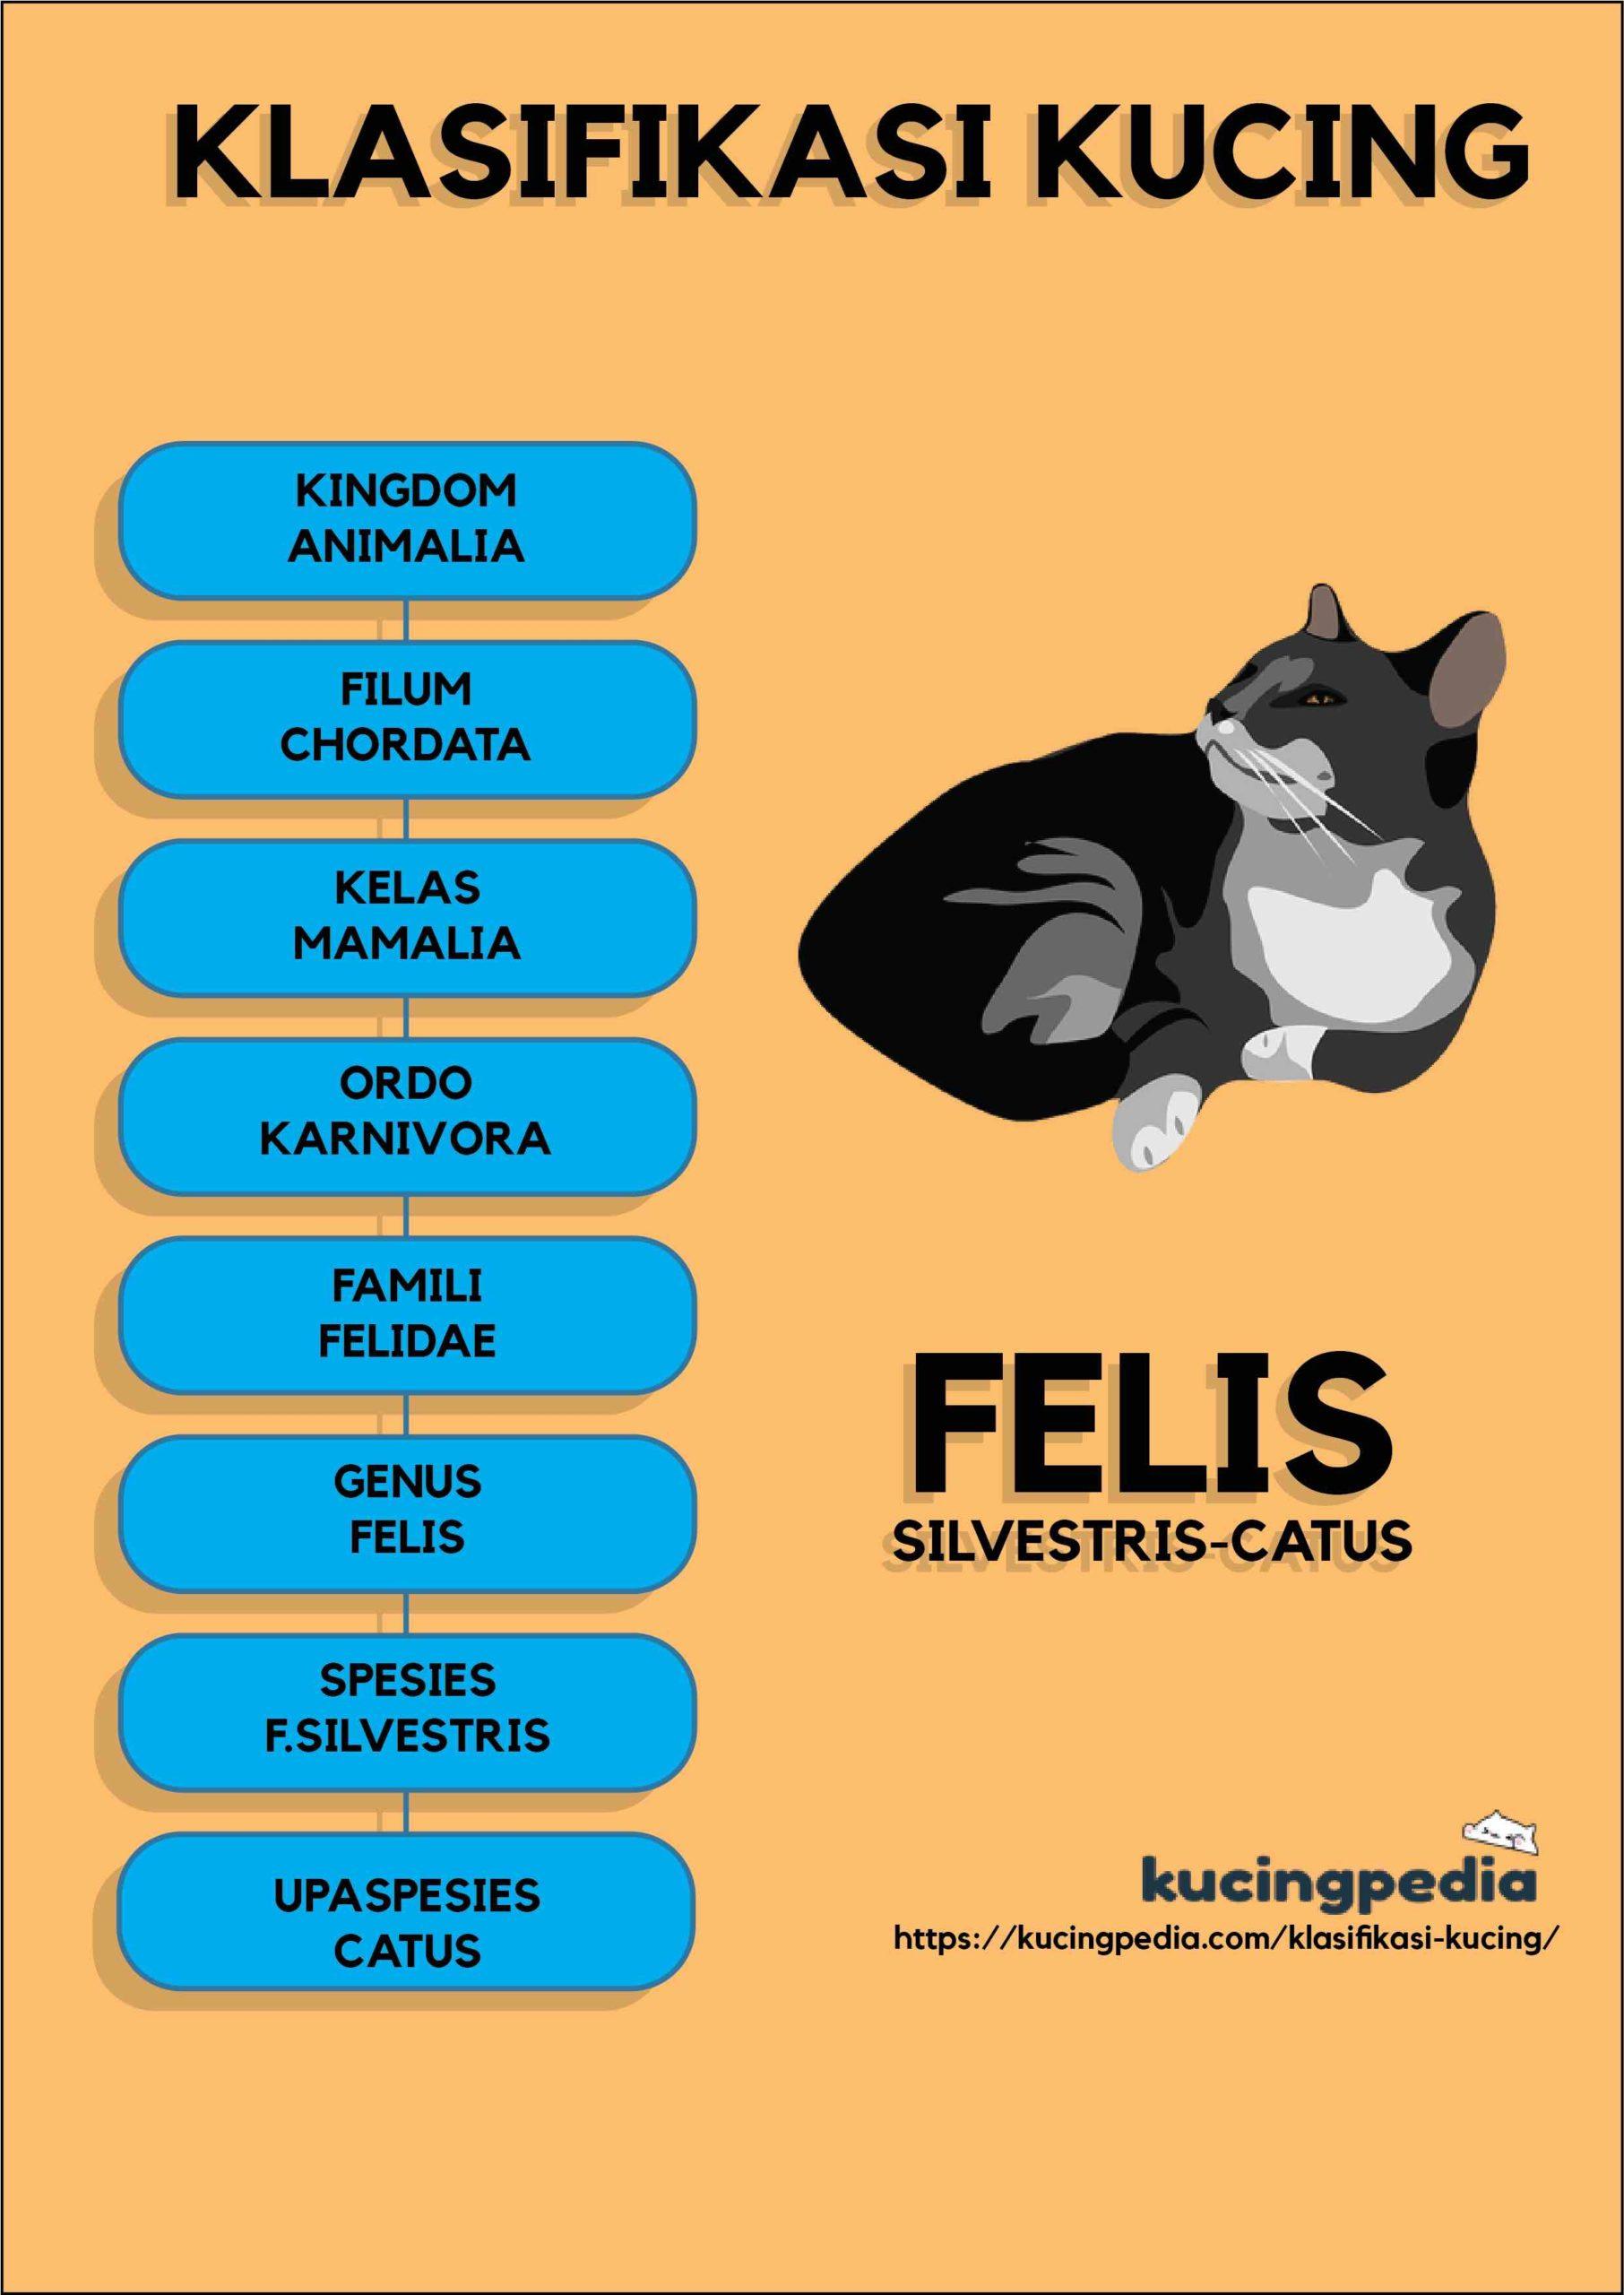 infografis klasifikasi kucing via kucingpedia